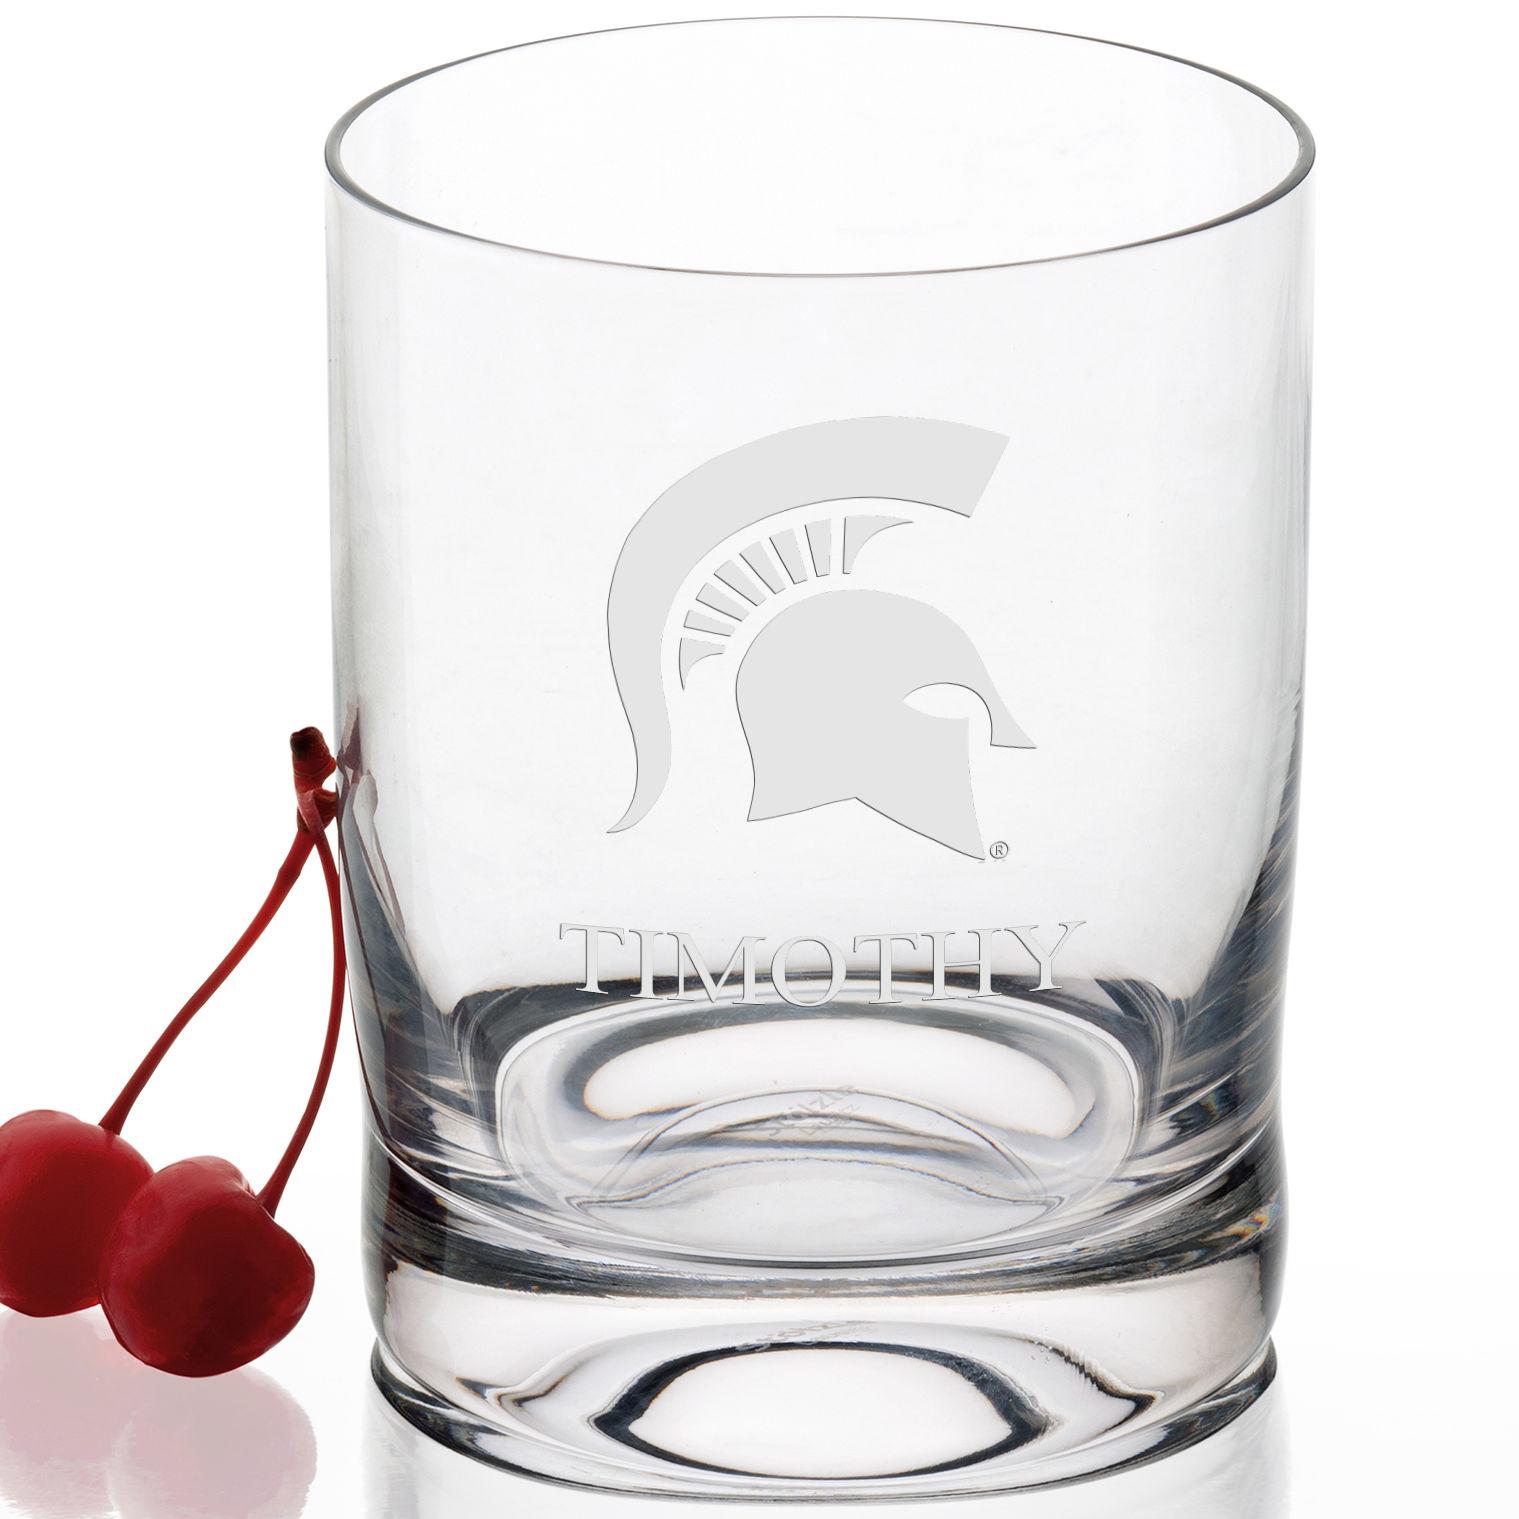 Michigan State University Tumbler Glasses - Set of 2 - Image 2